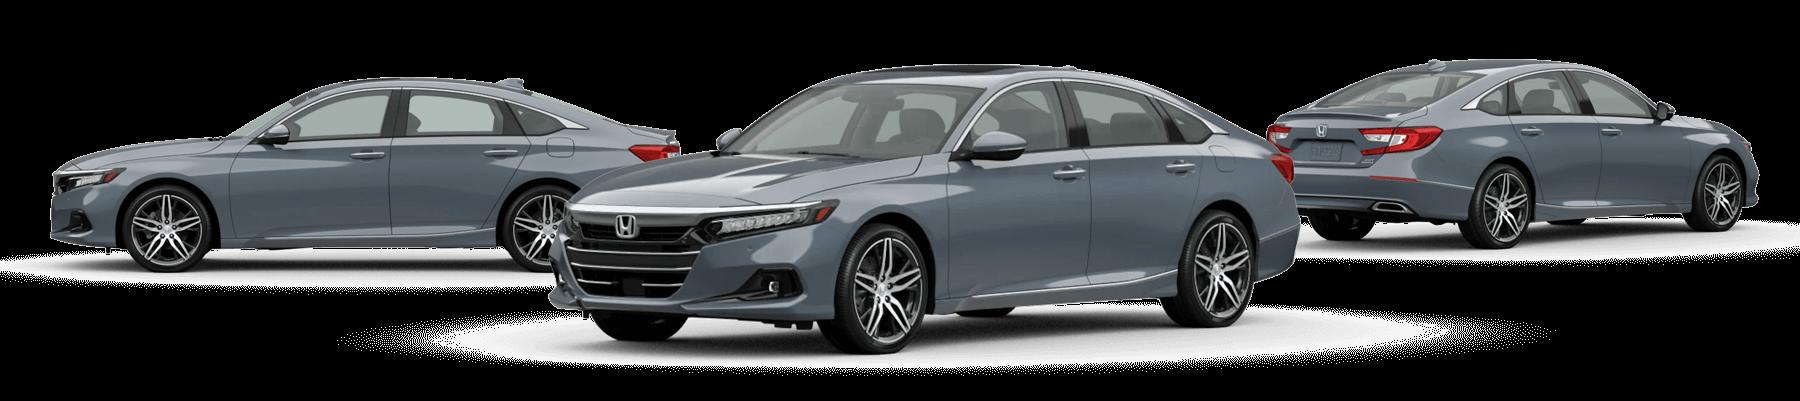 New 2021 Honda Accord Color Sonic Gray Pearl